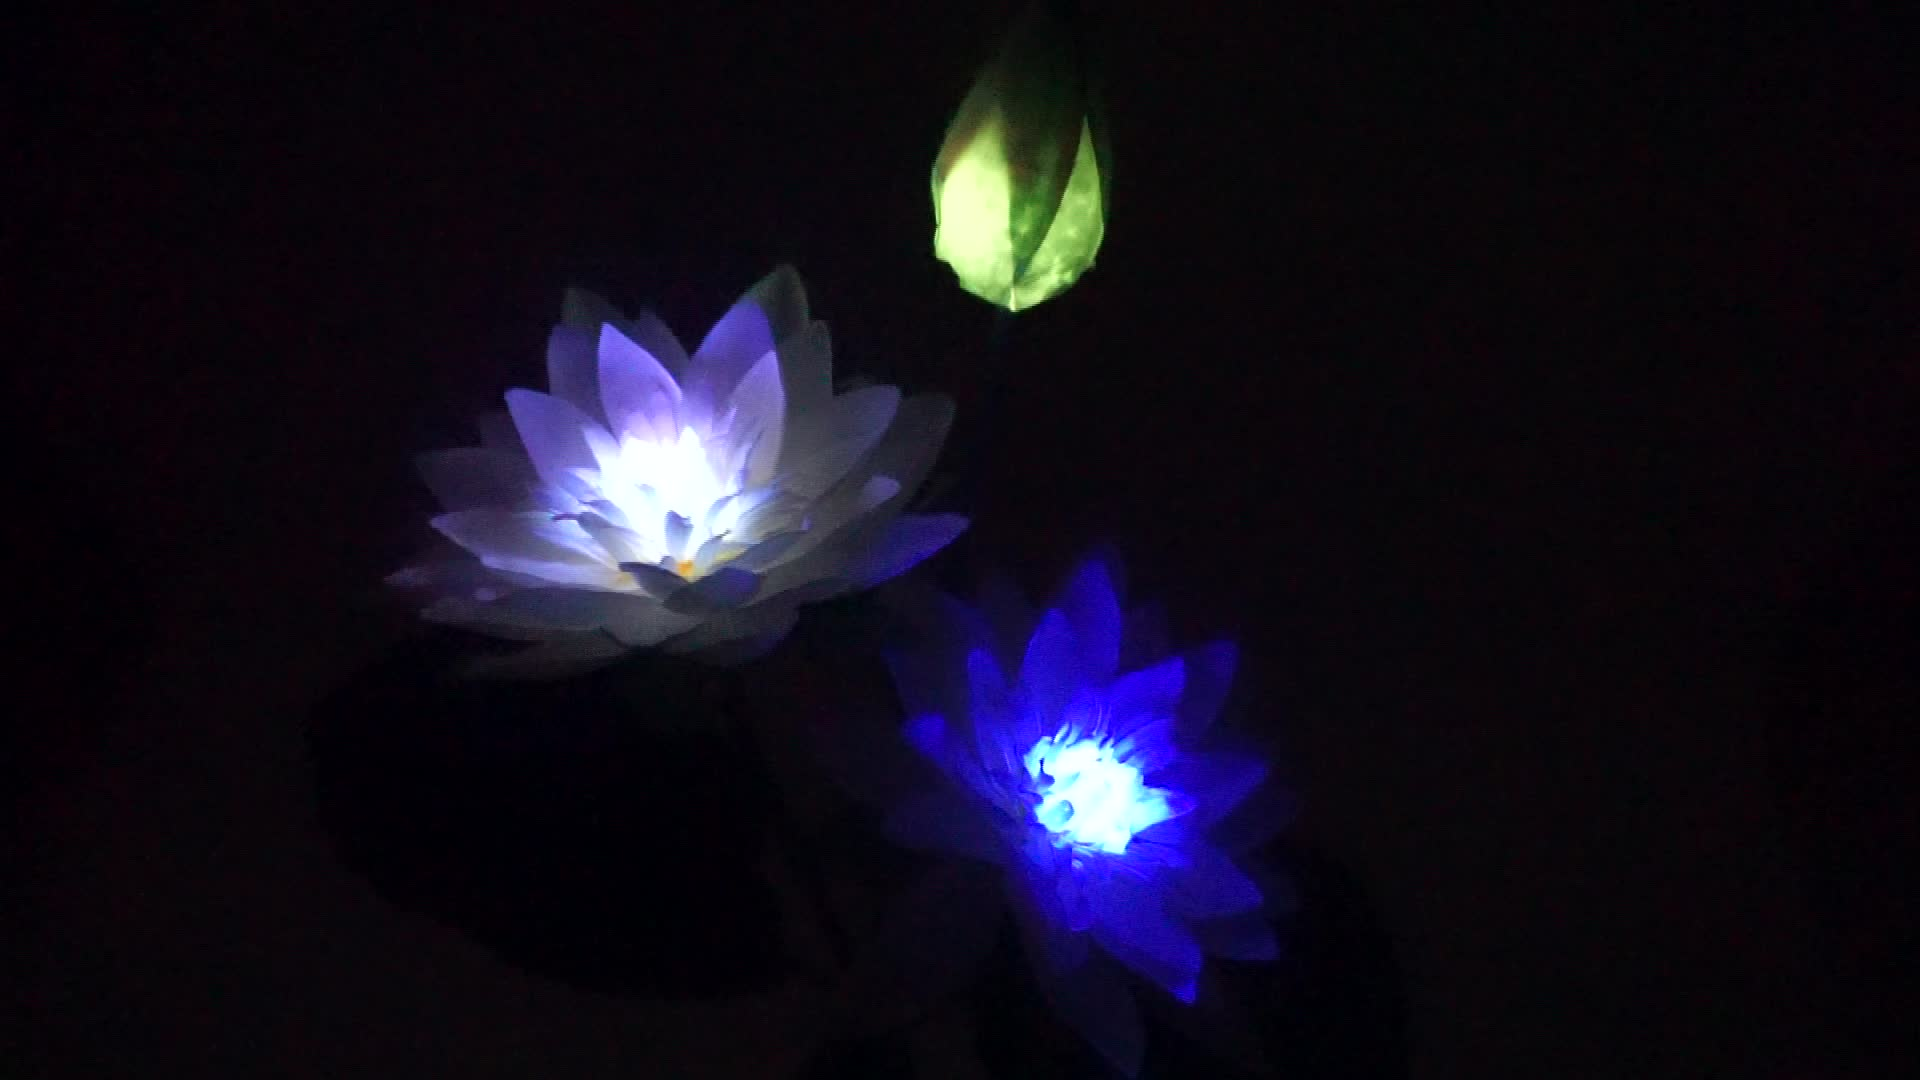 Outdoor LED Artificial Solar Flower Lights Garden Decorative Led Lawn Lamps 3 Branch Solar Lotus Light